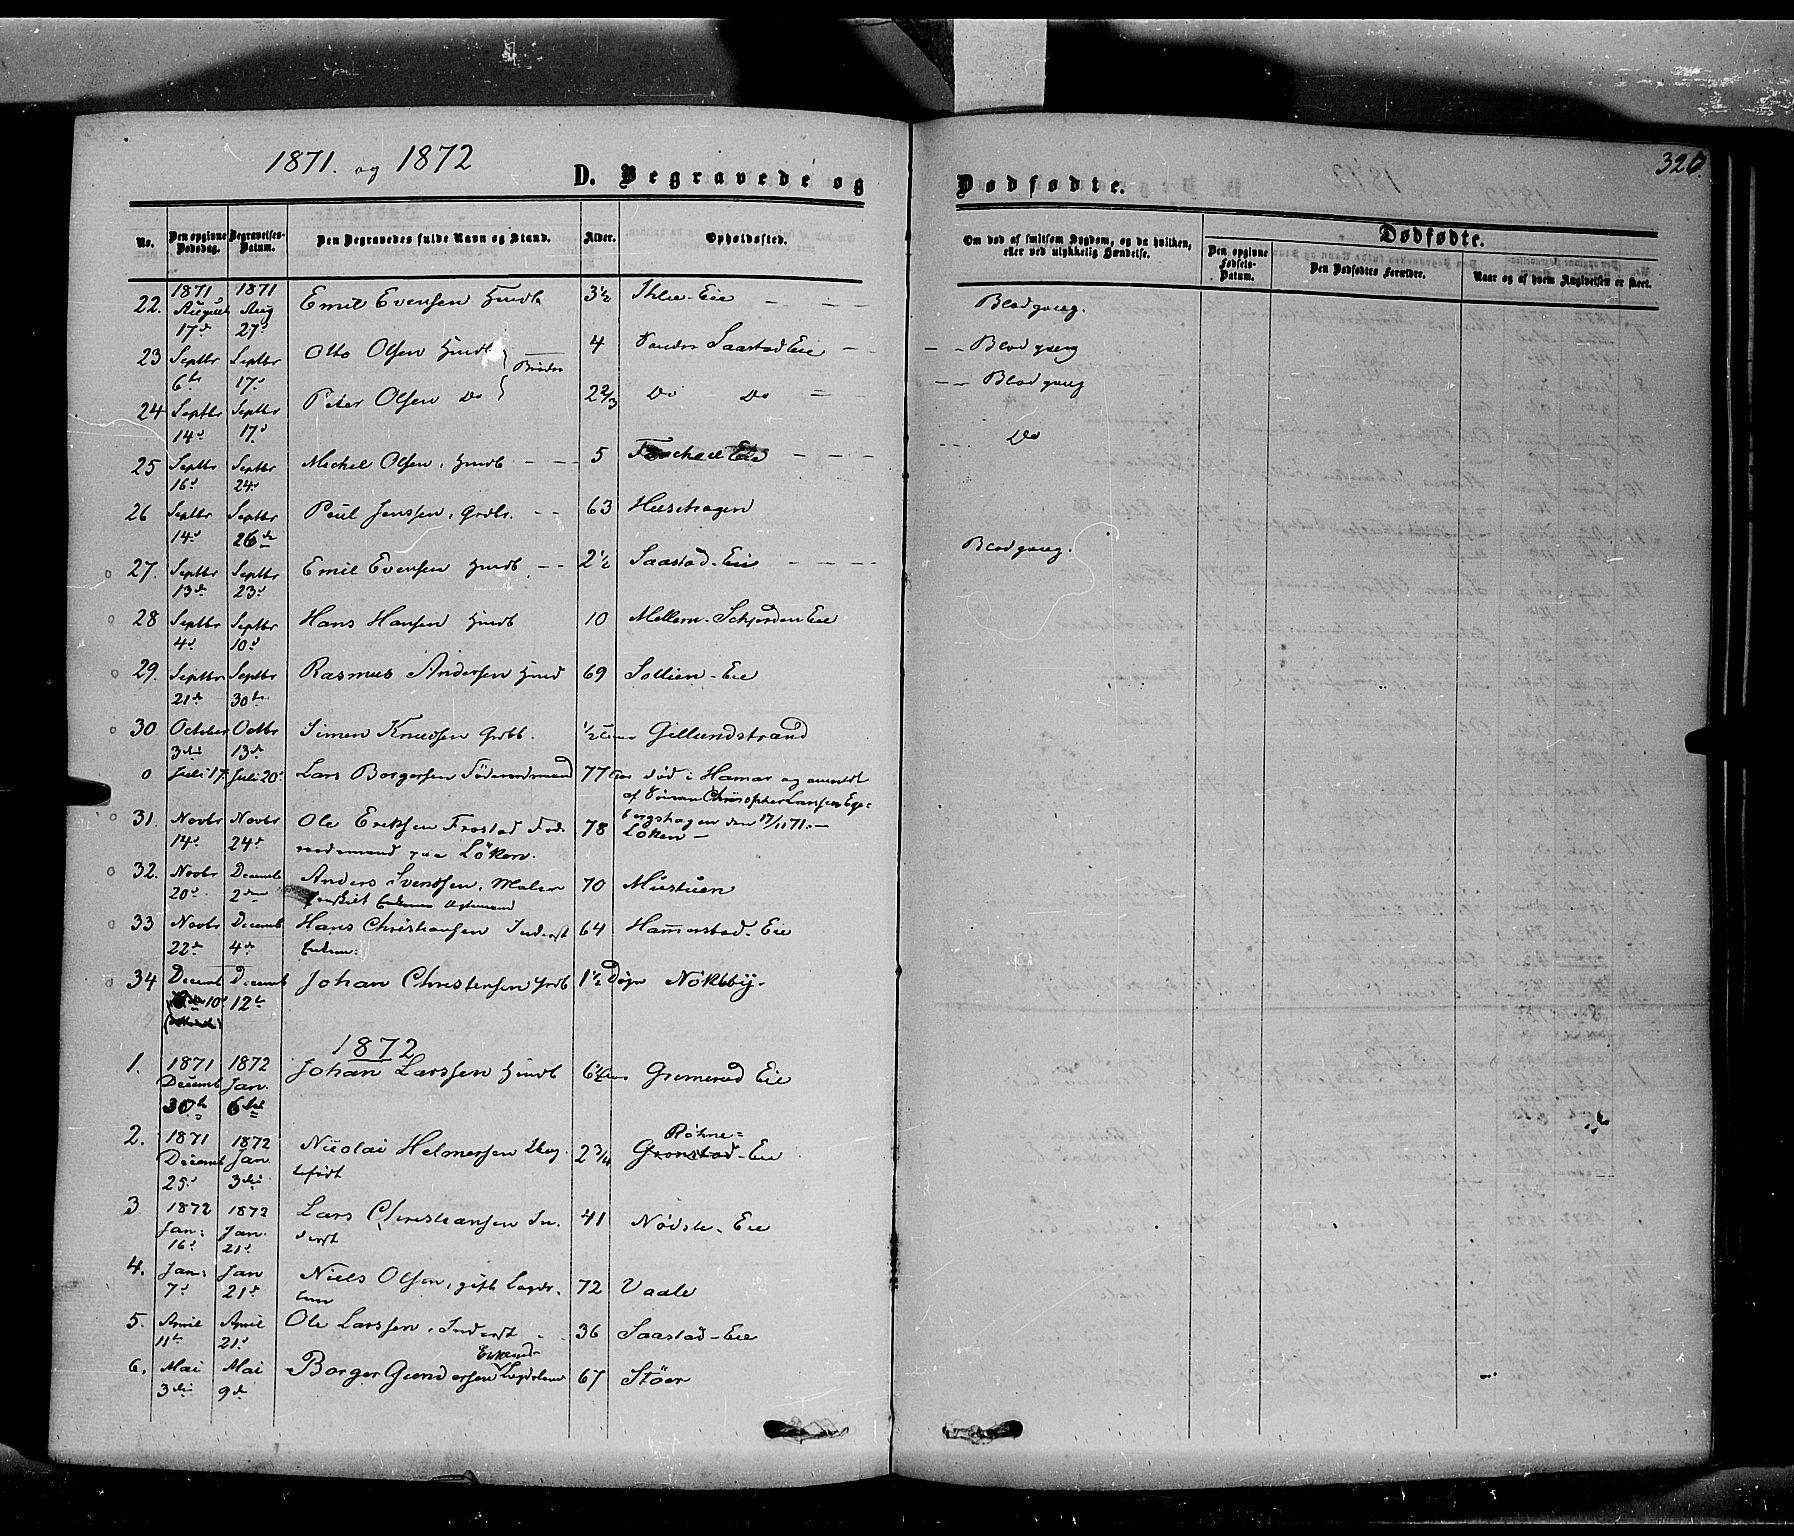 SAH, Stange prestekontor, K/L0013: Ministerialbok nr. 13, 1862-1879, s. 326